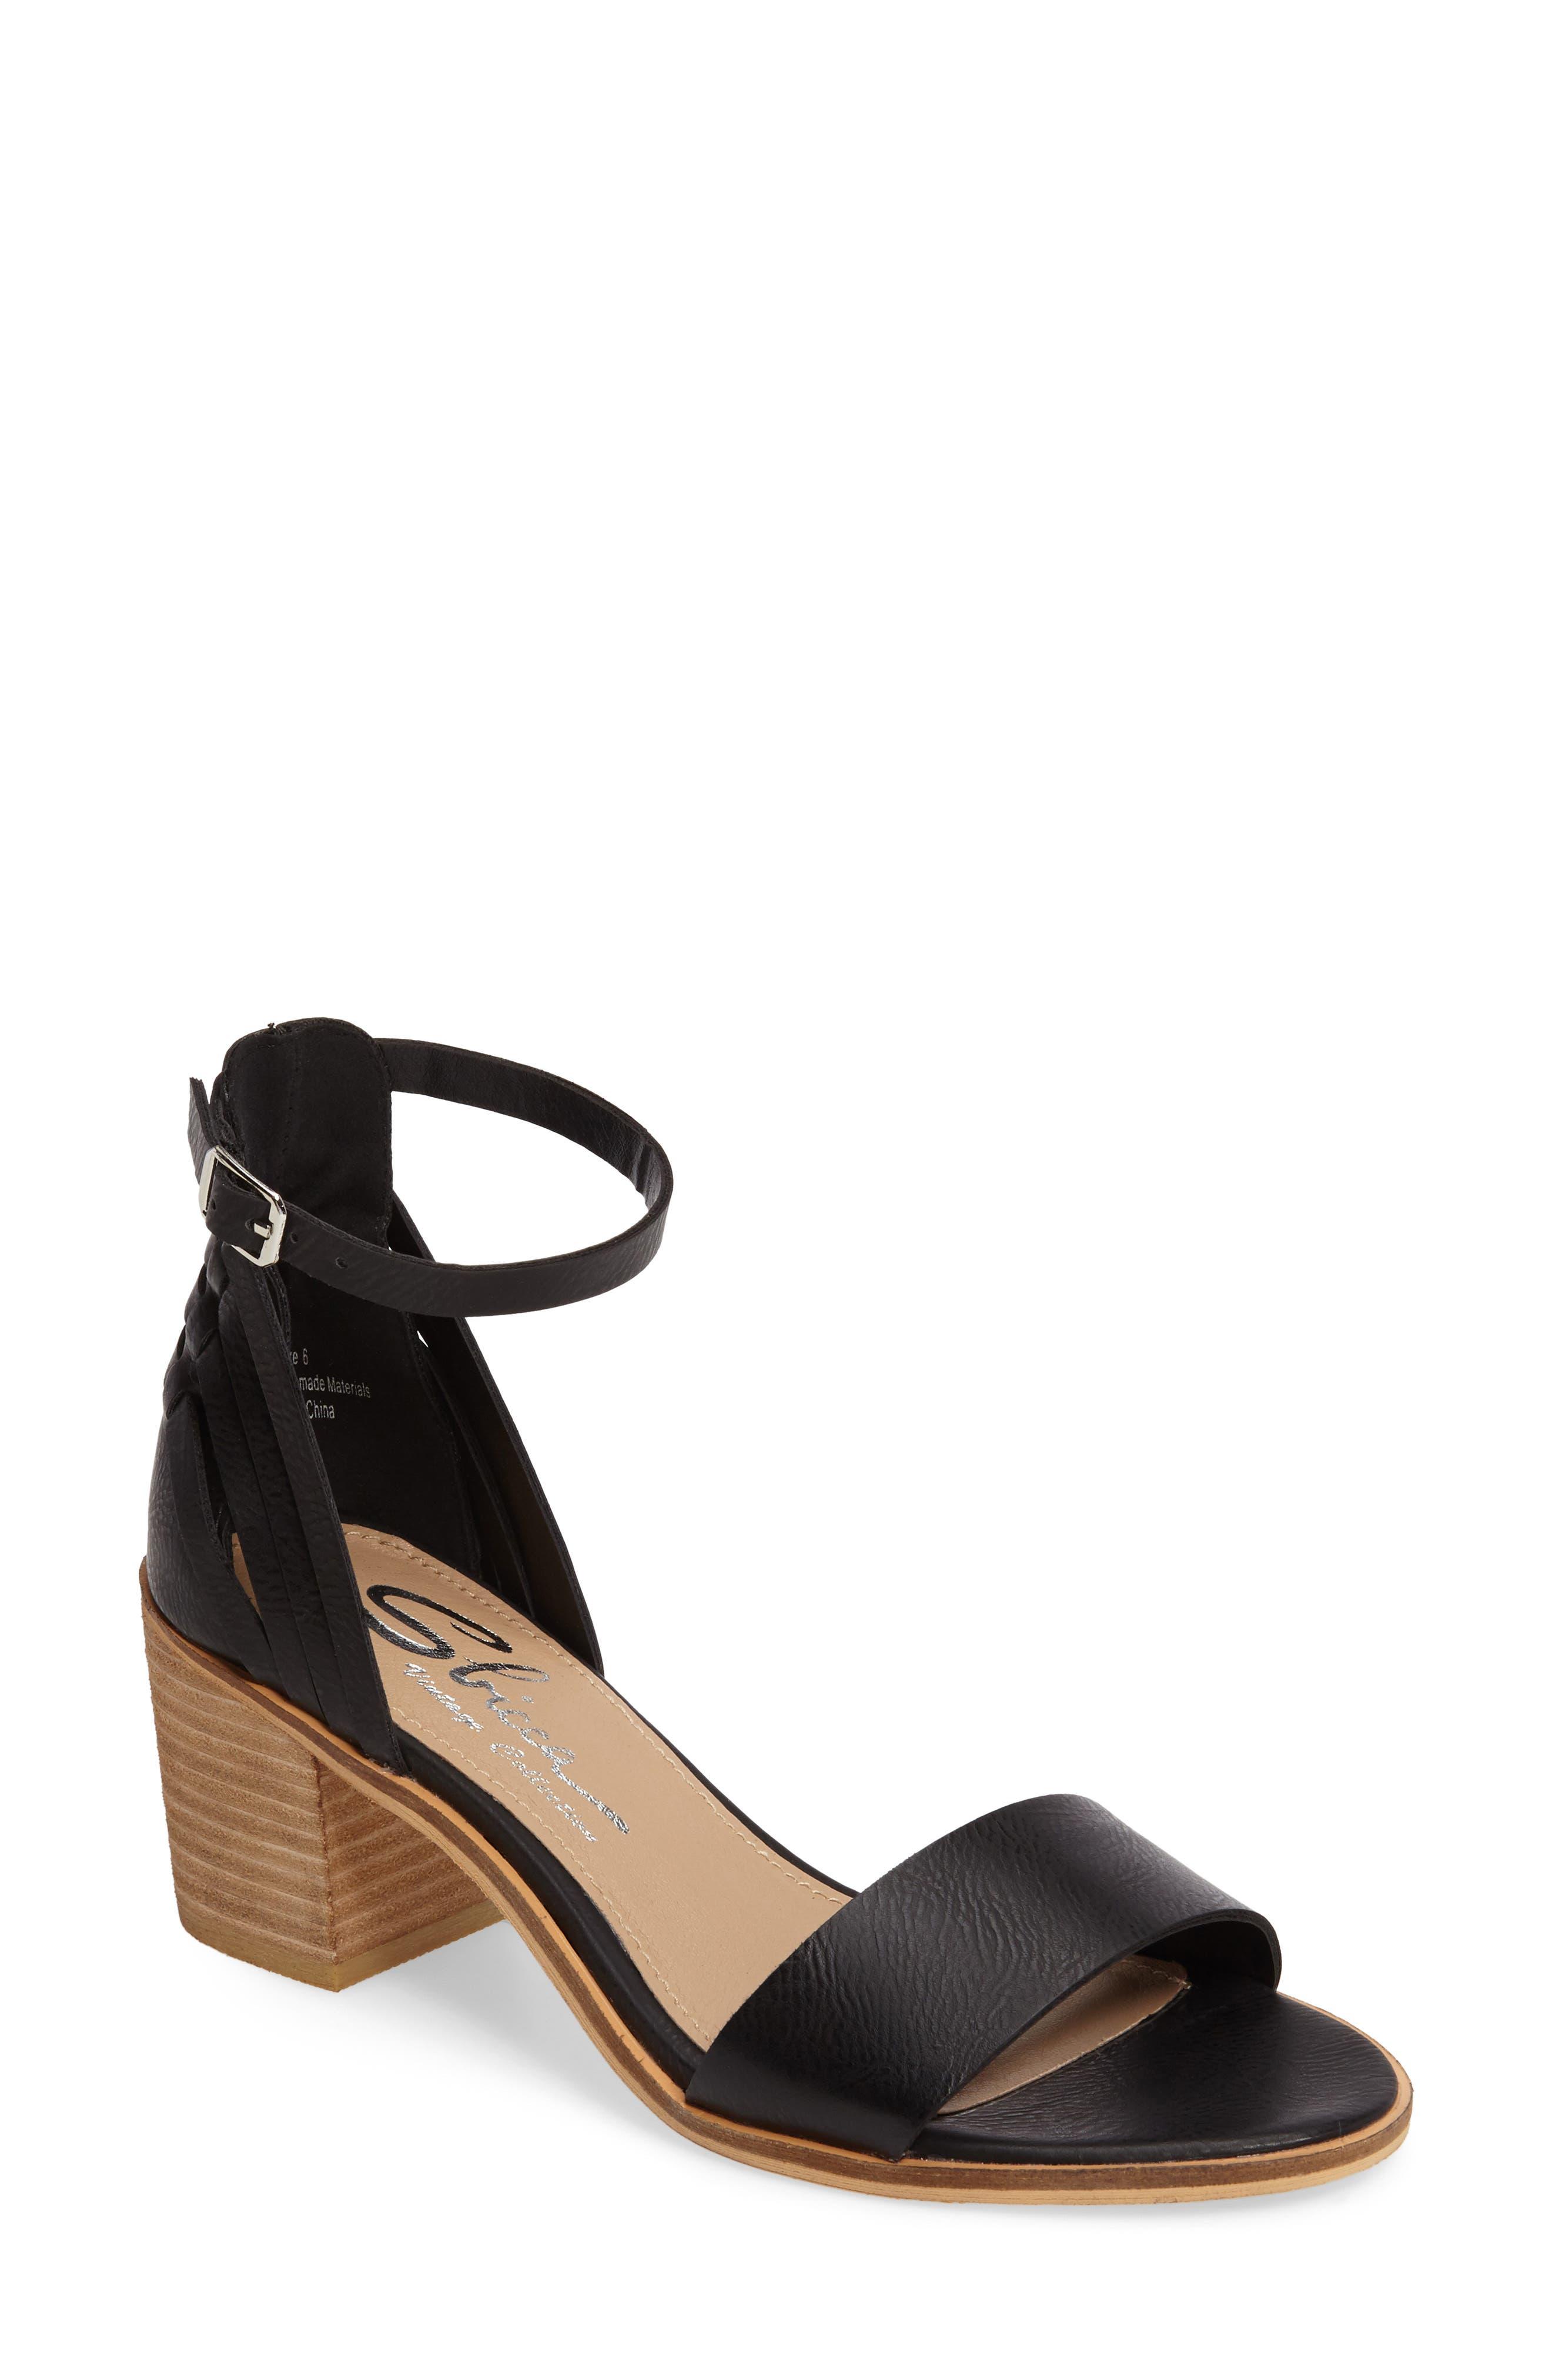 Main Image - Sbicca Fars Block Heel Sandal (Women)